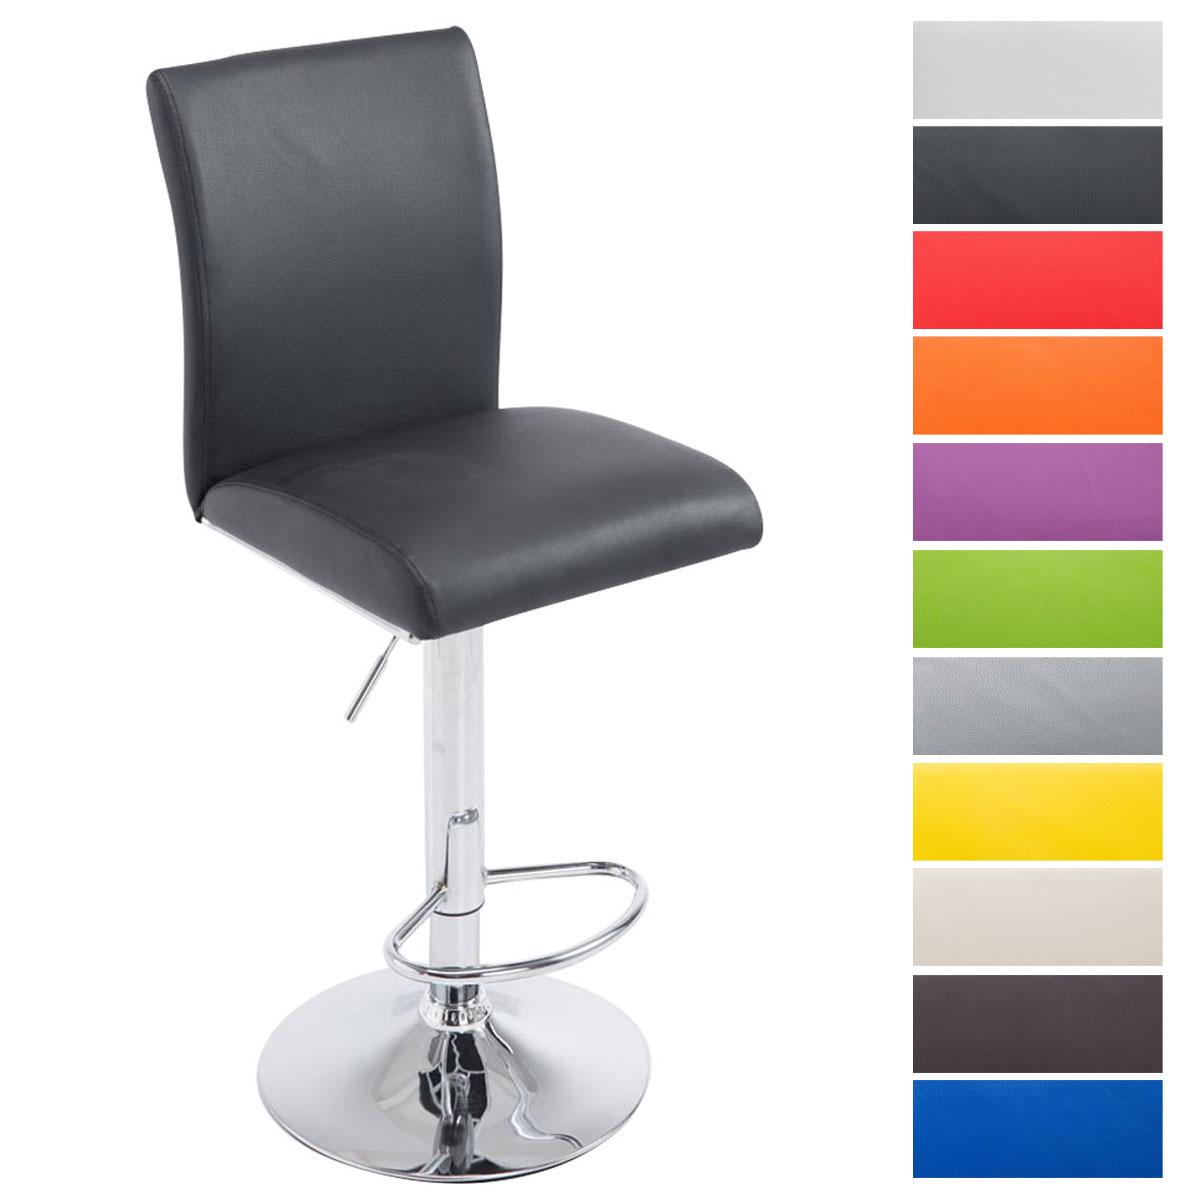 barhocker k ln neu design drehstuhl barstuhl mit lehne bartresen k che ebay. Black Bedroom Furniture Sets. Home Design Ideas